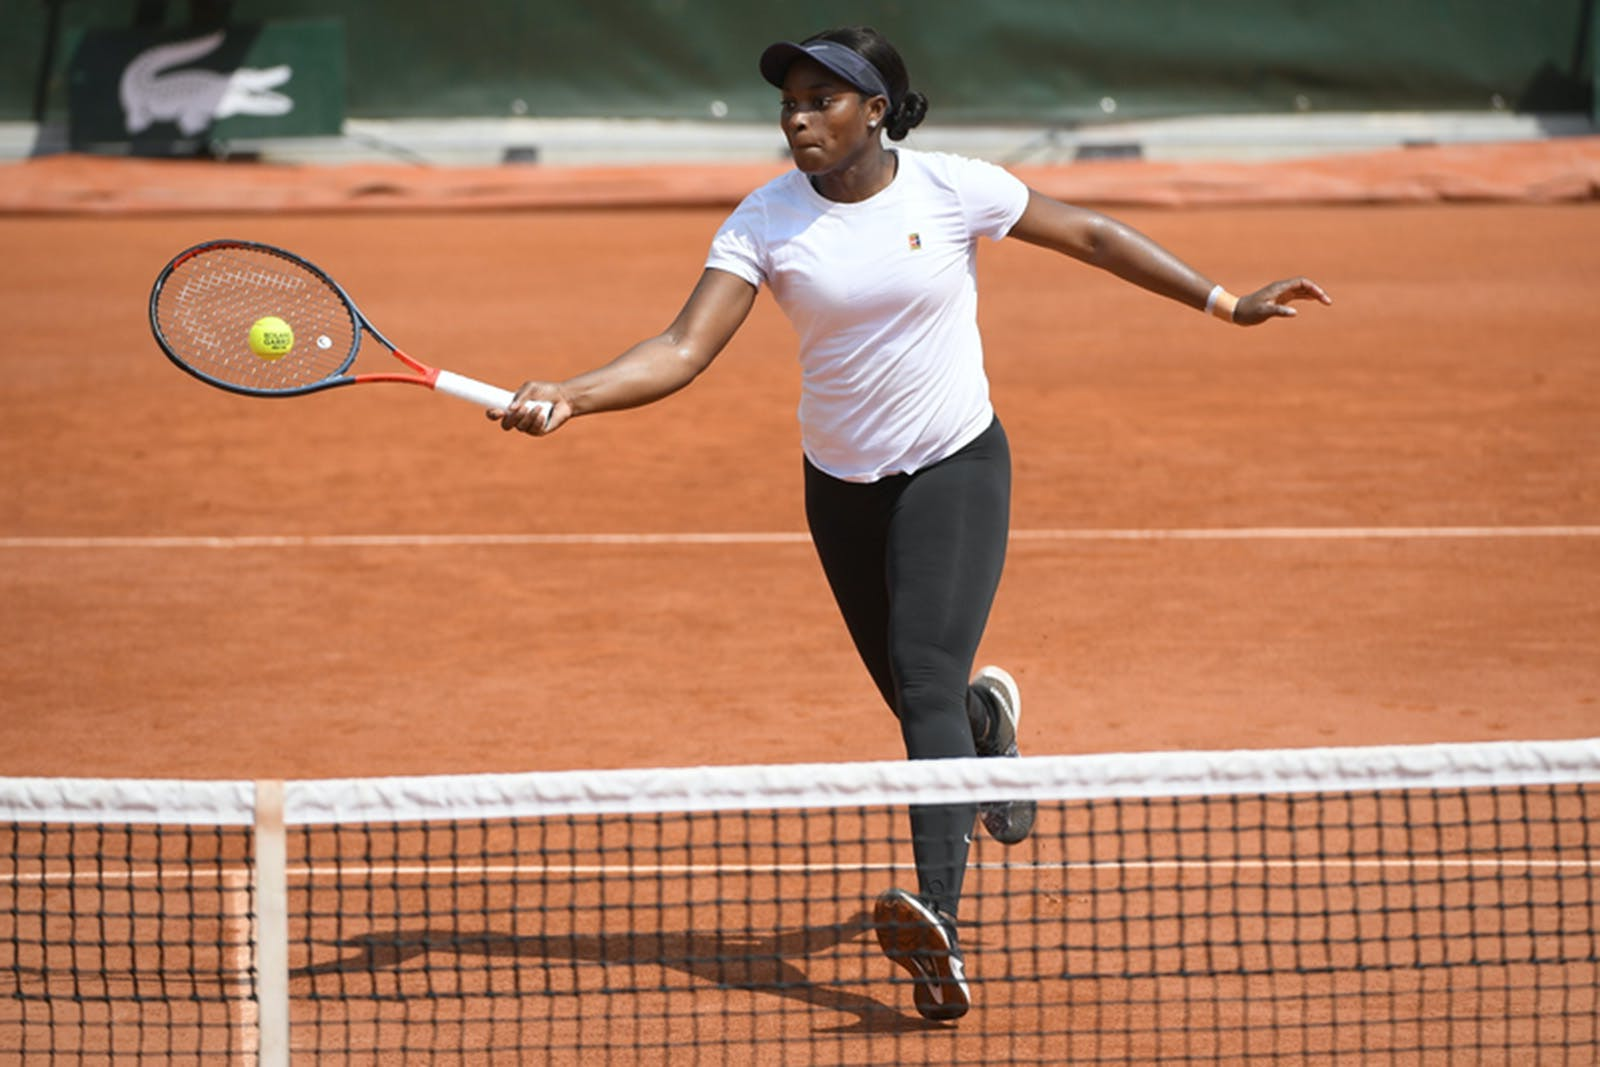 Sloane Stephens at Roland-Garros practice